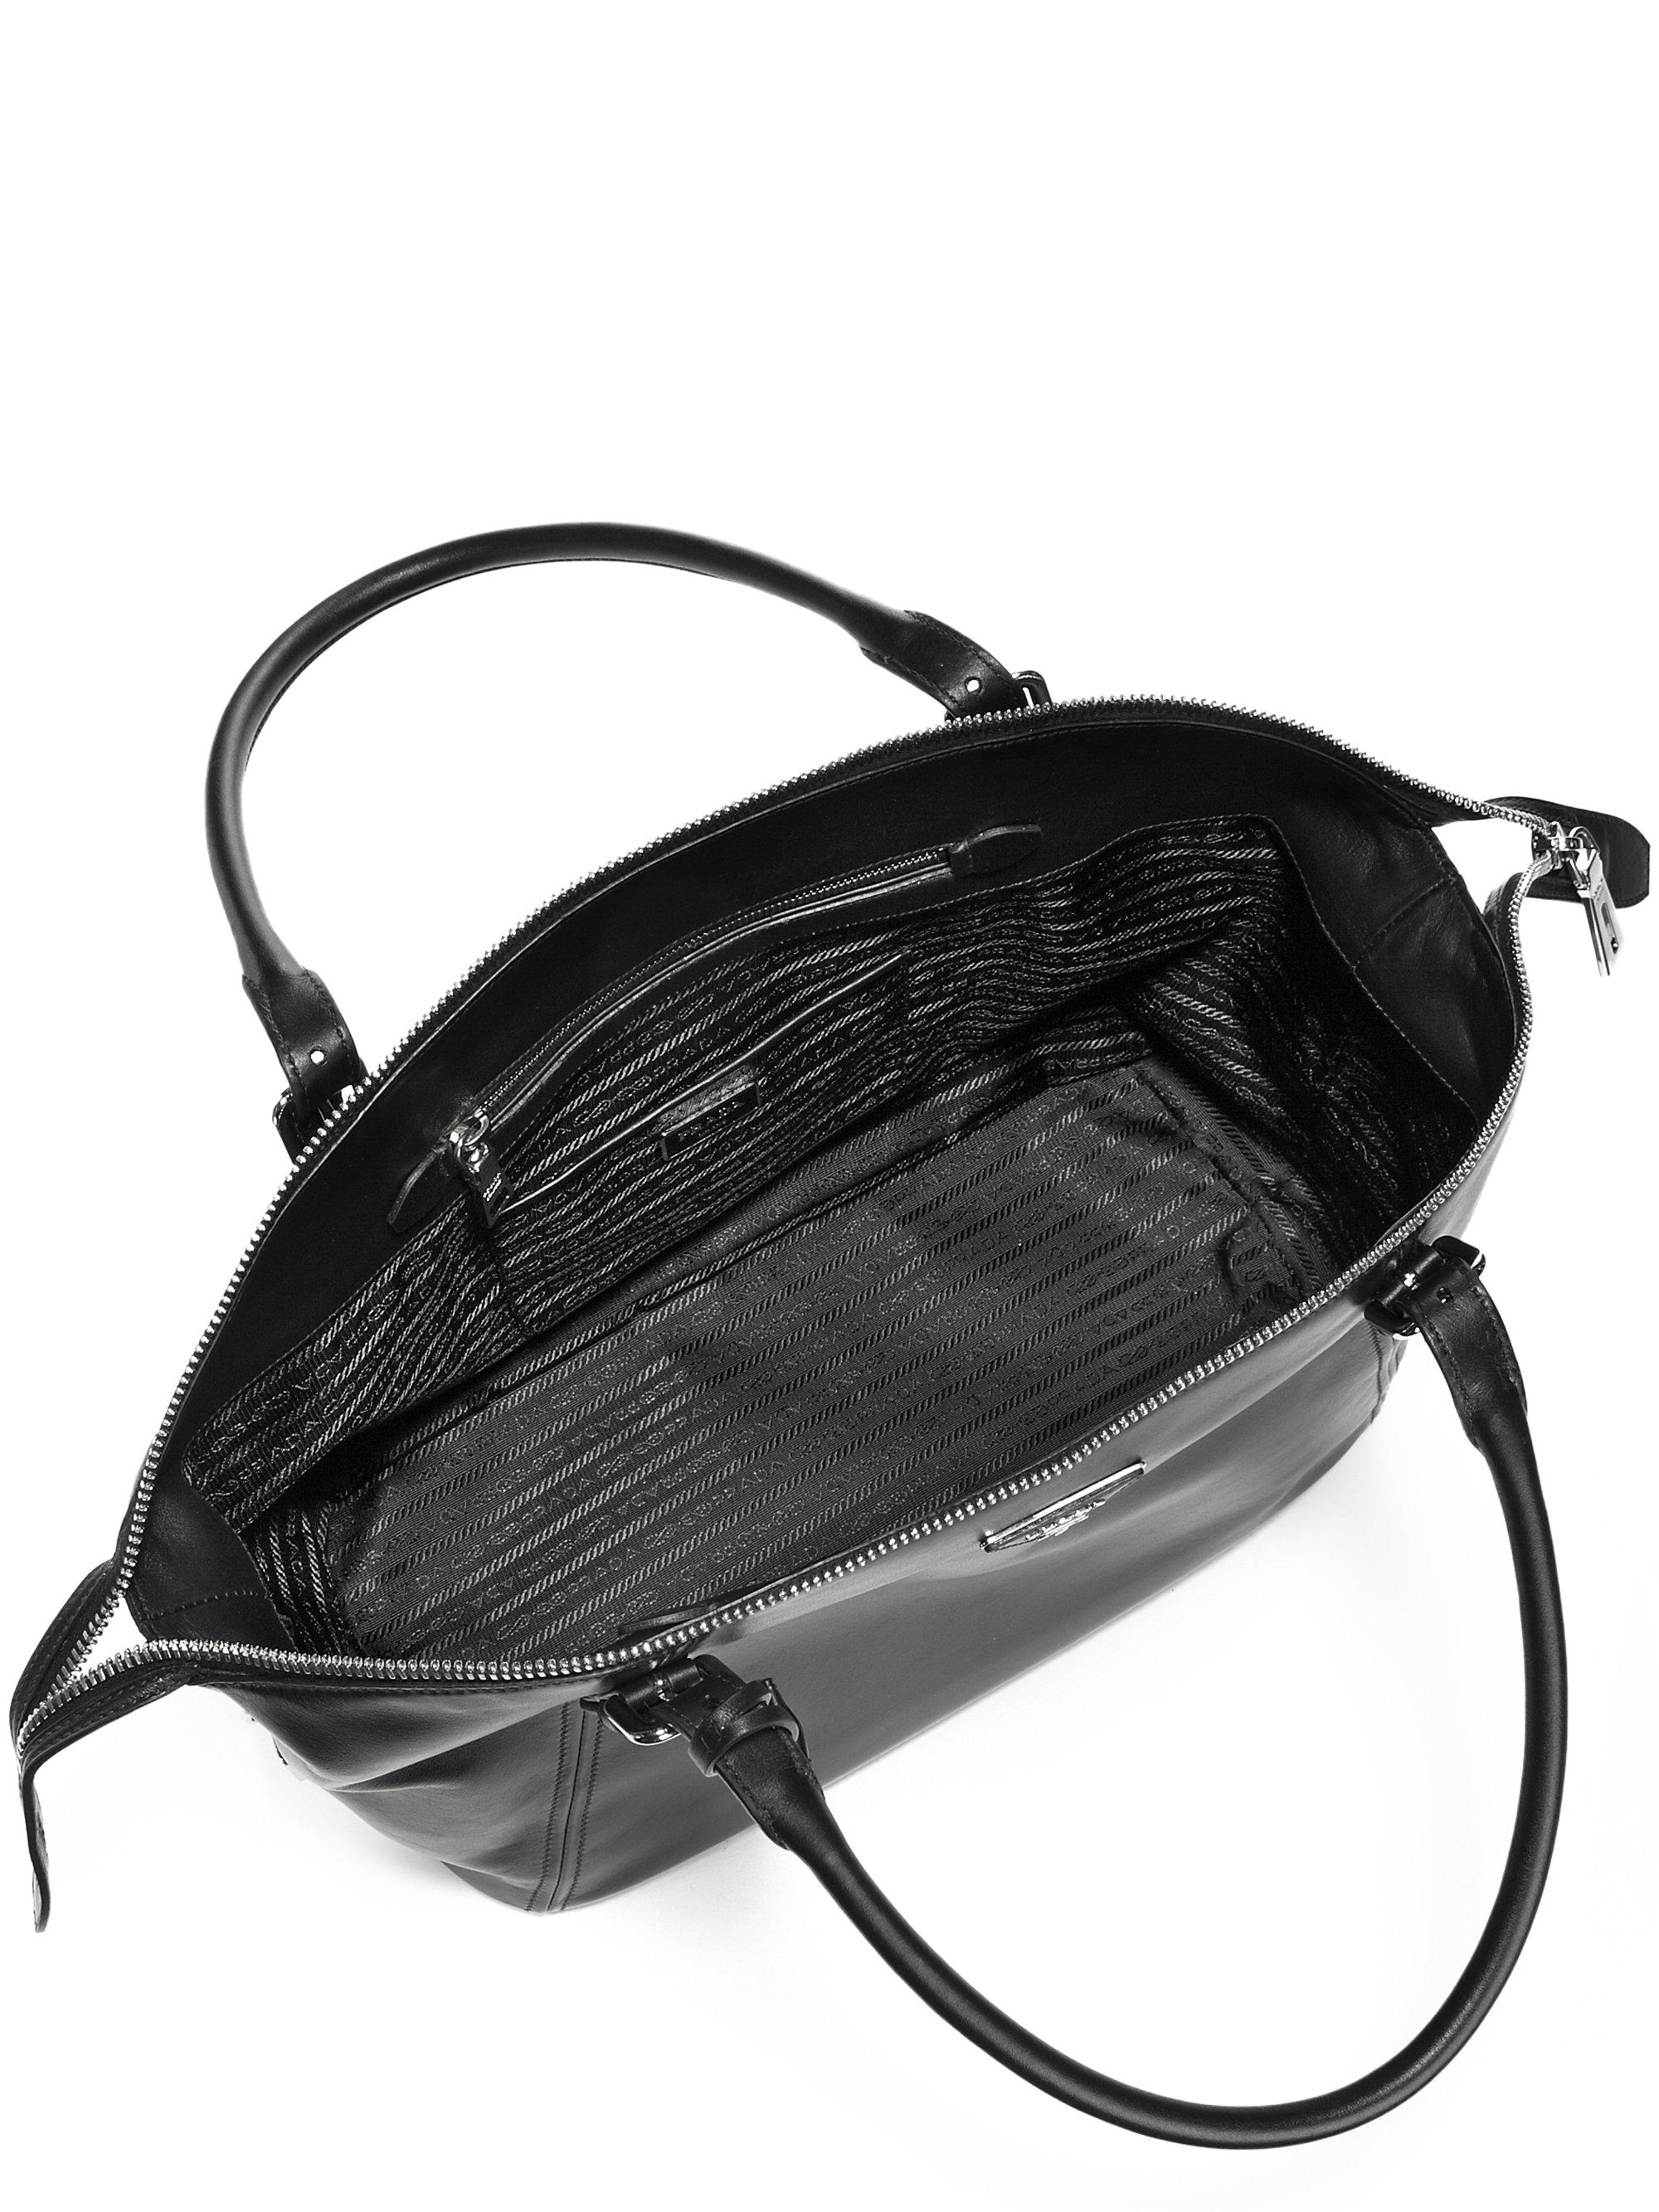 prada baltic nero handbag